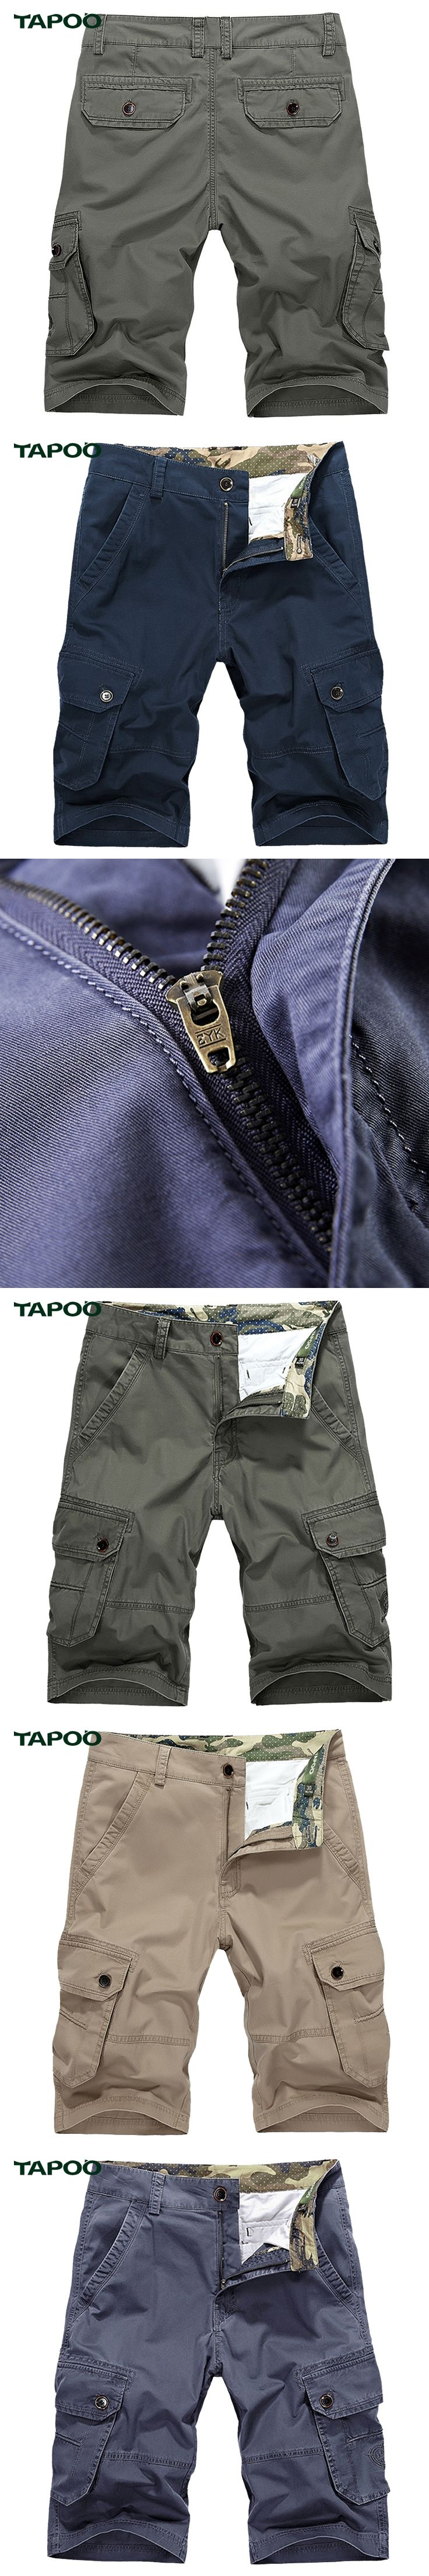 Plus Size 44 Mens Cargo Shorts Military Tapoo Brand-clothing Summer Casual Denim Bermudas Hombre pantalon corto mujer Military